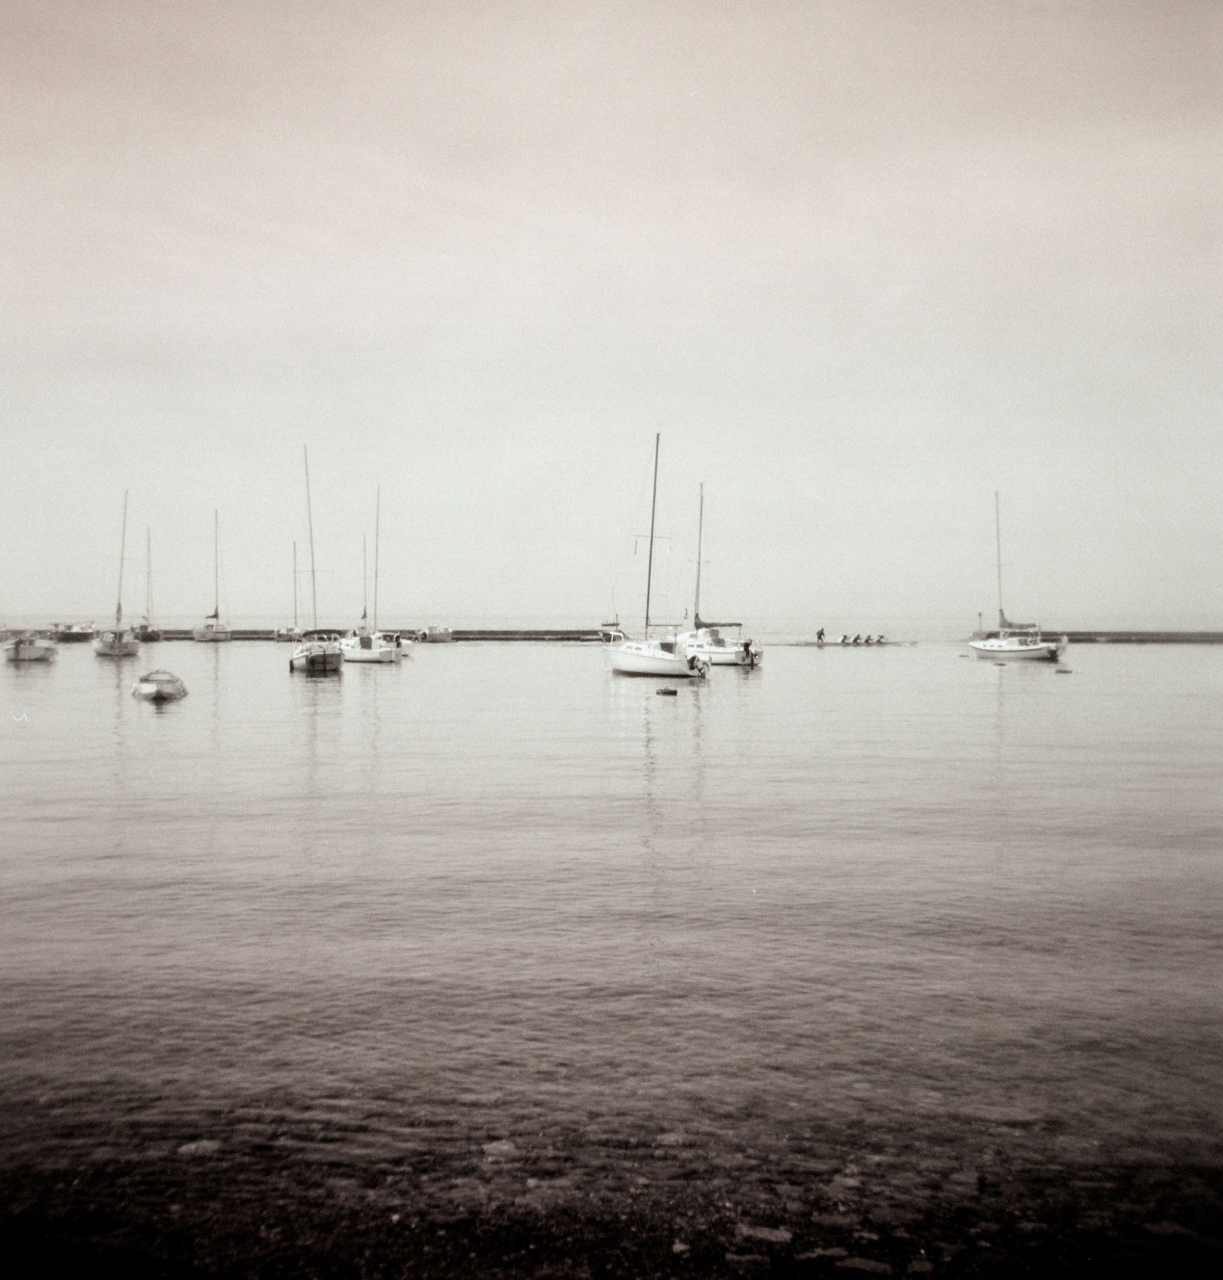 Nancy Bueler, Sail Boats, 2018